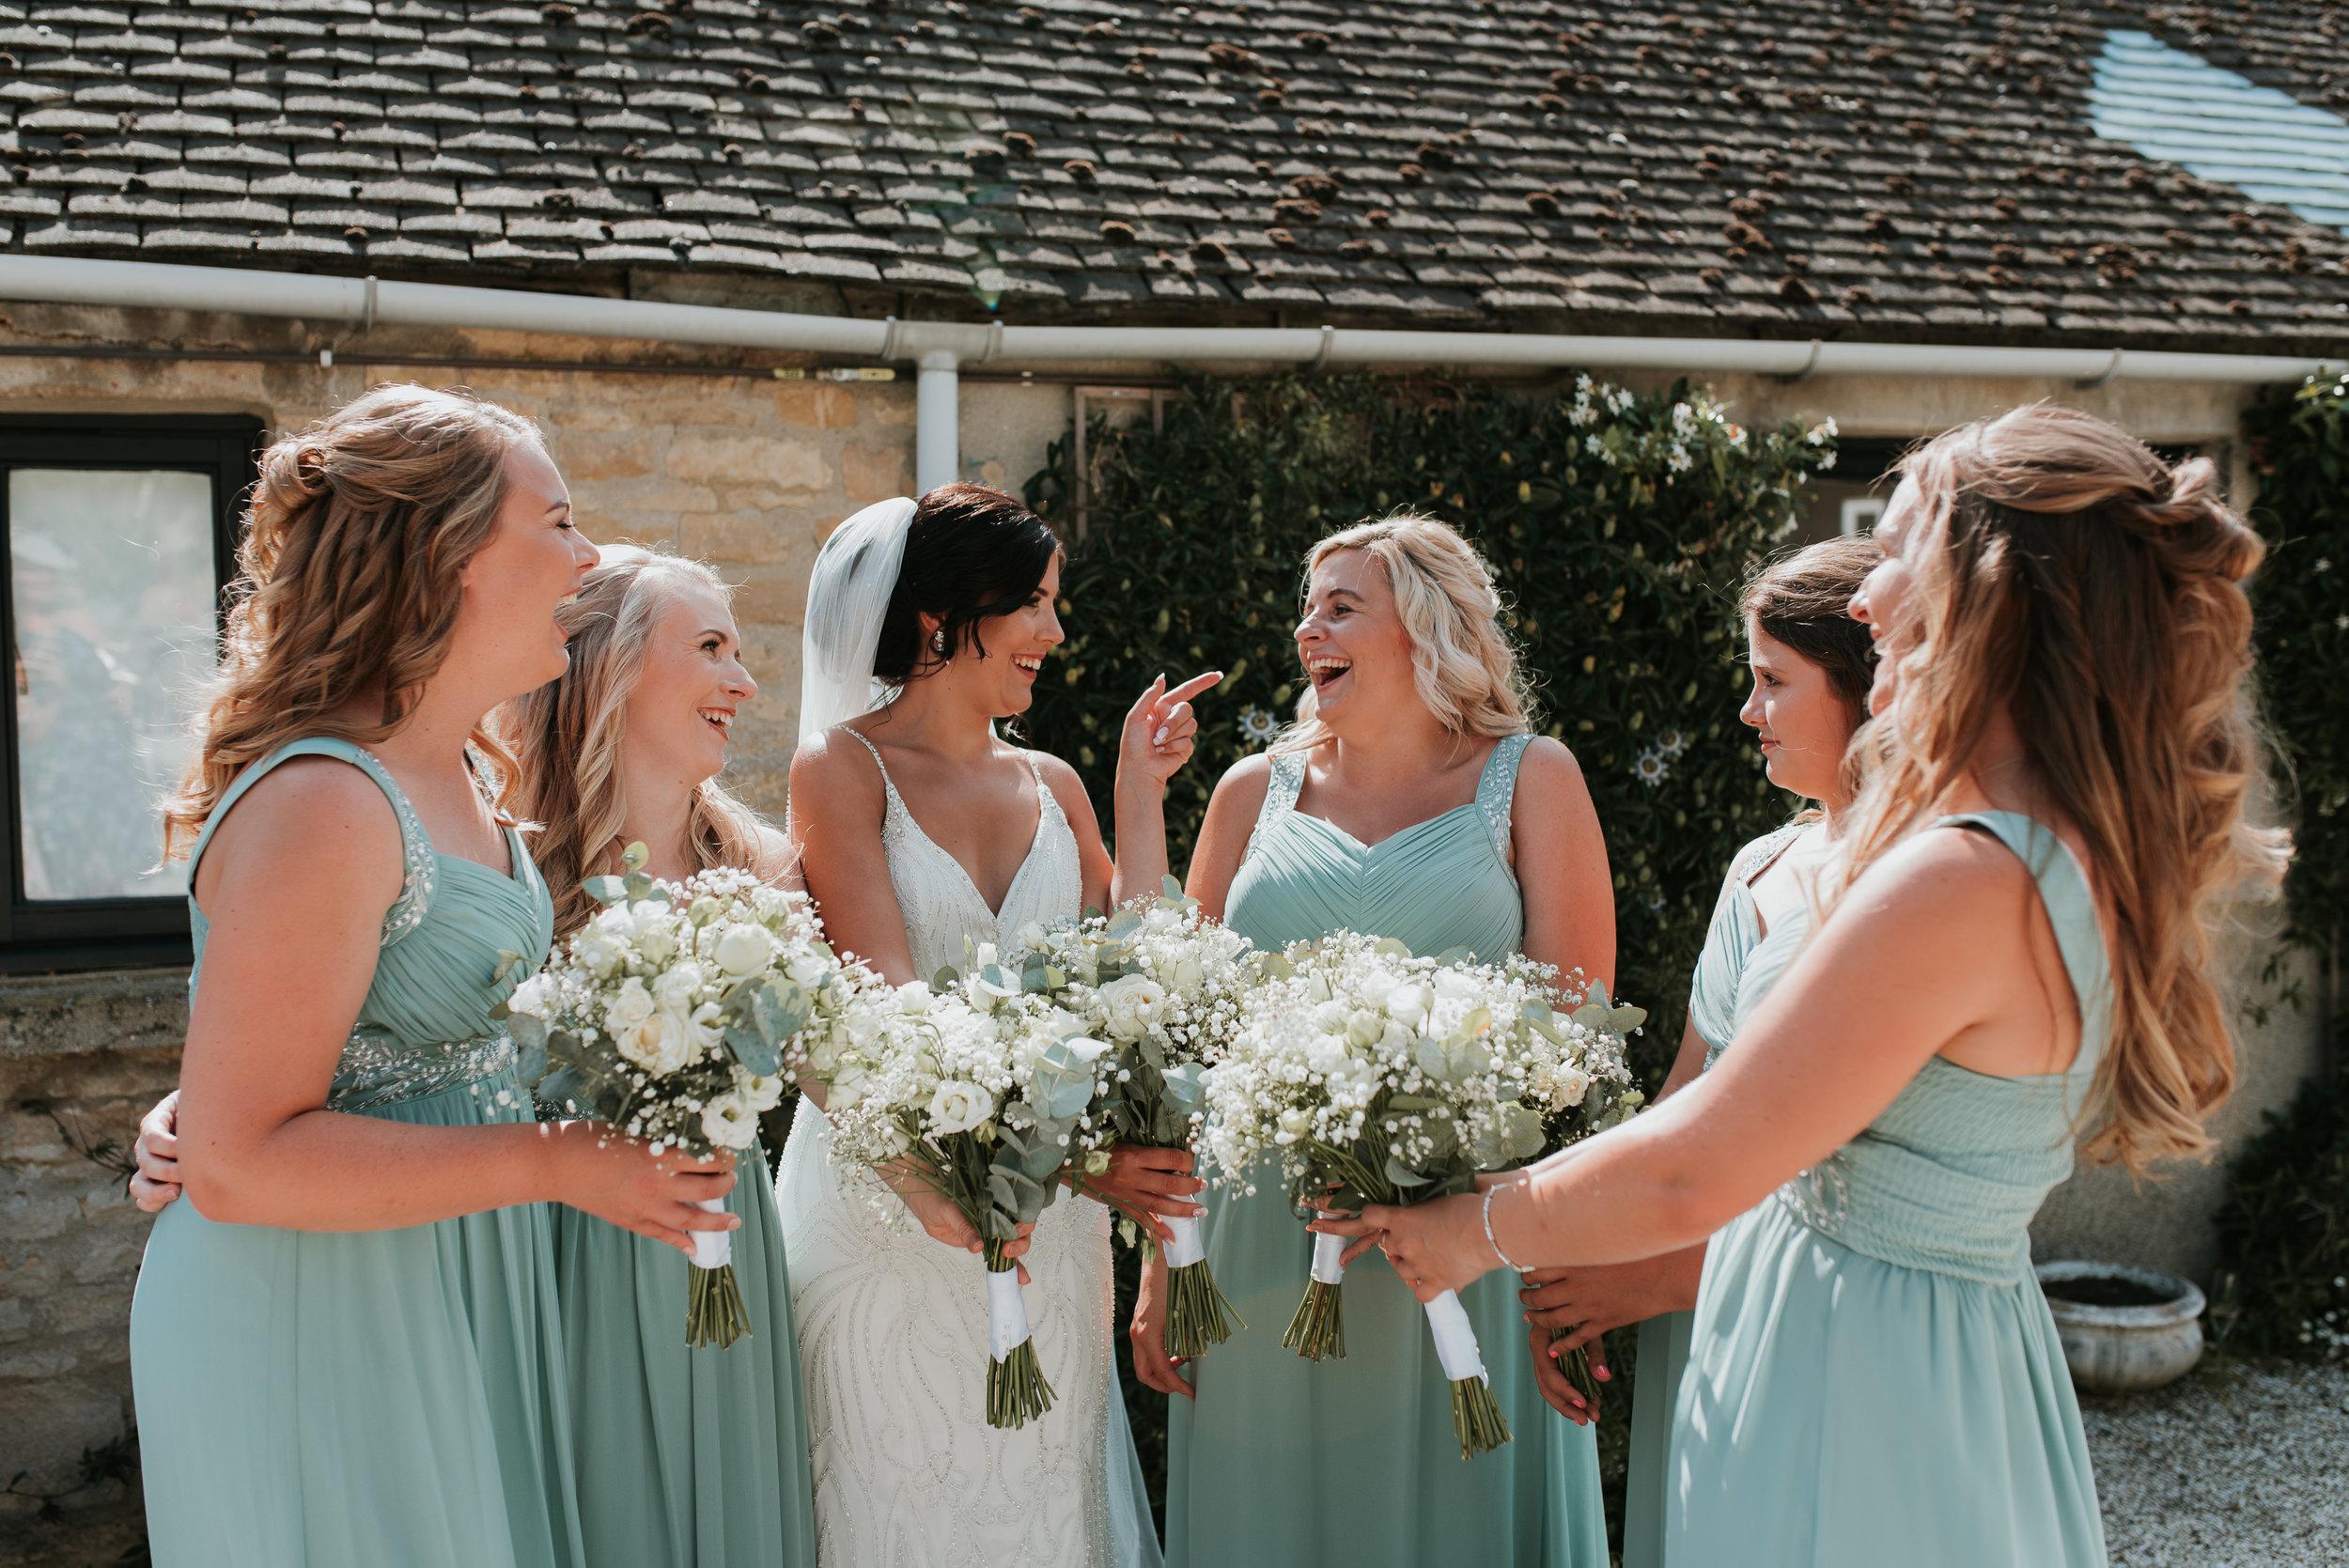 Oxfordshire-wedding-photographer-53.jpg